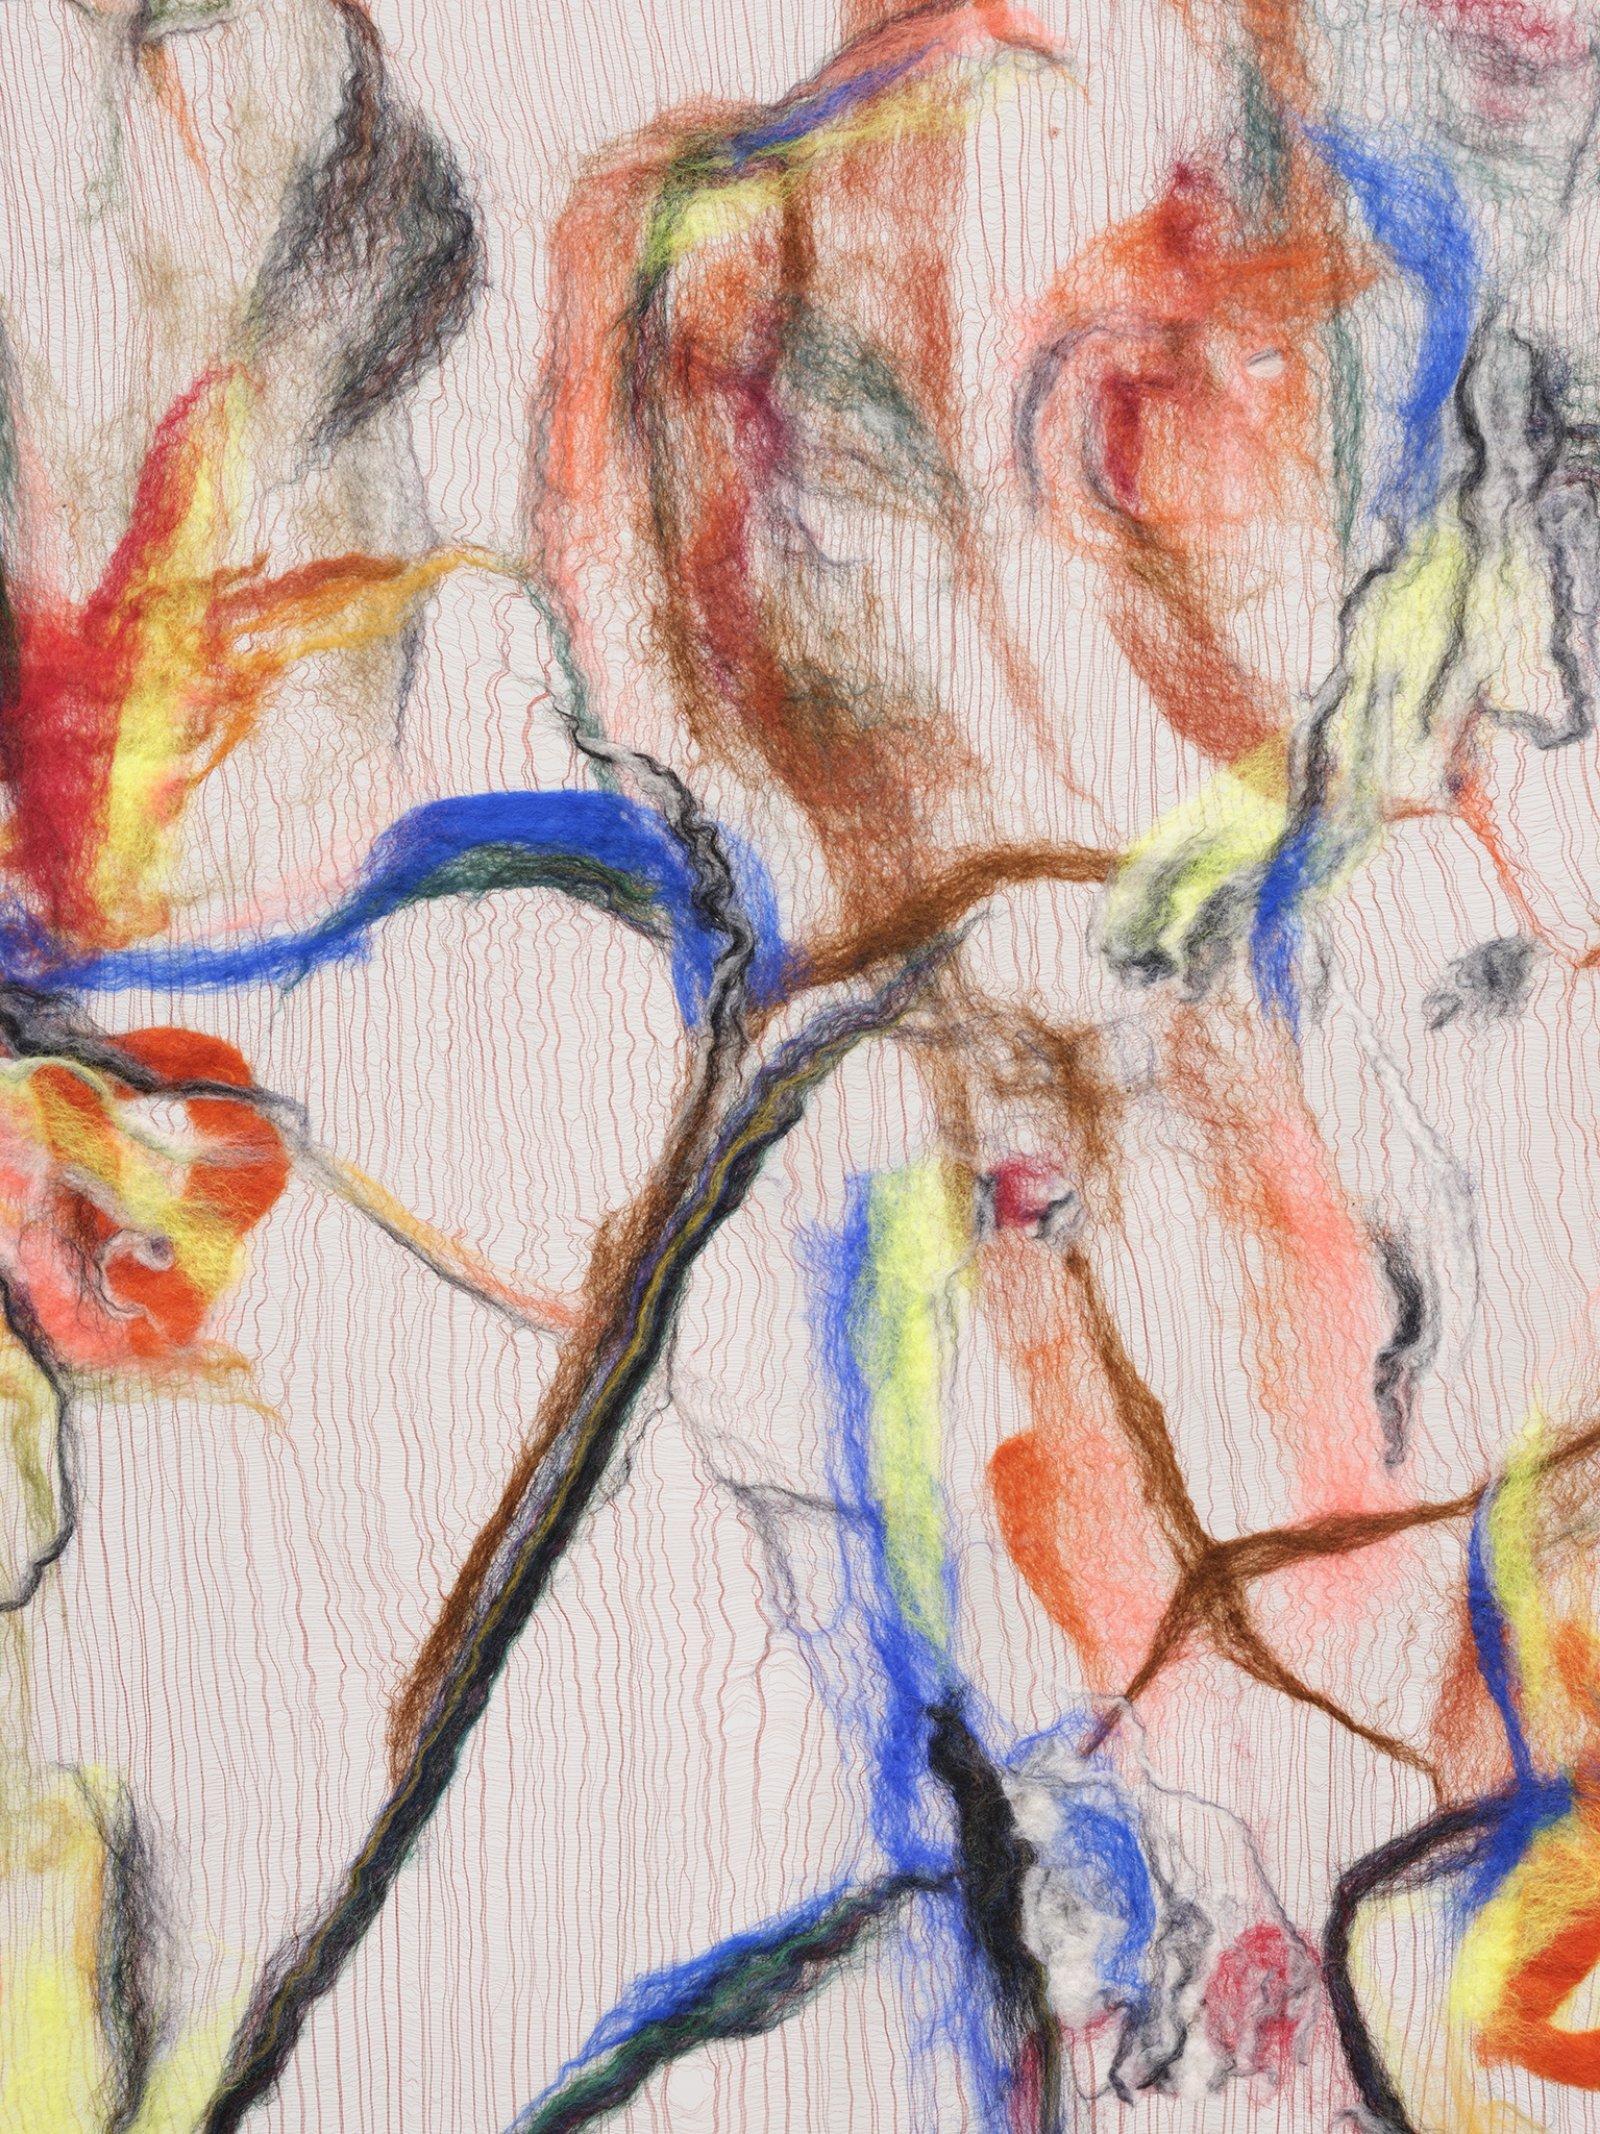 Rebecca Brewer, Scrim: Tweaker (detail), 2019, silk, wool, ball chain, alligator clips, hooks, 103 x 39 in. (262 x 99 cm)